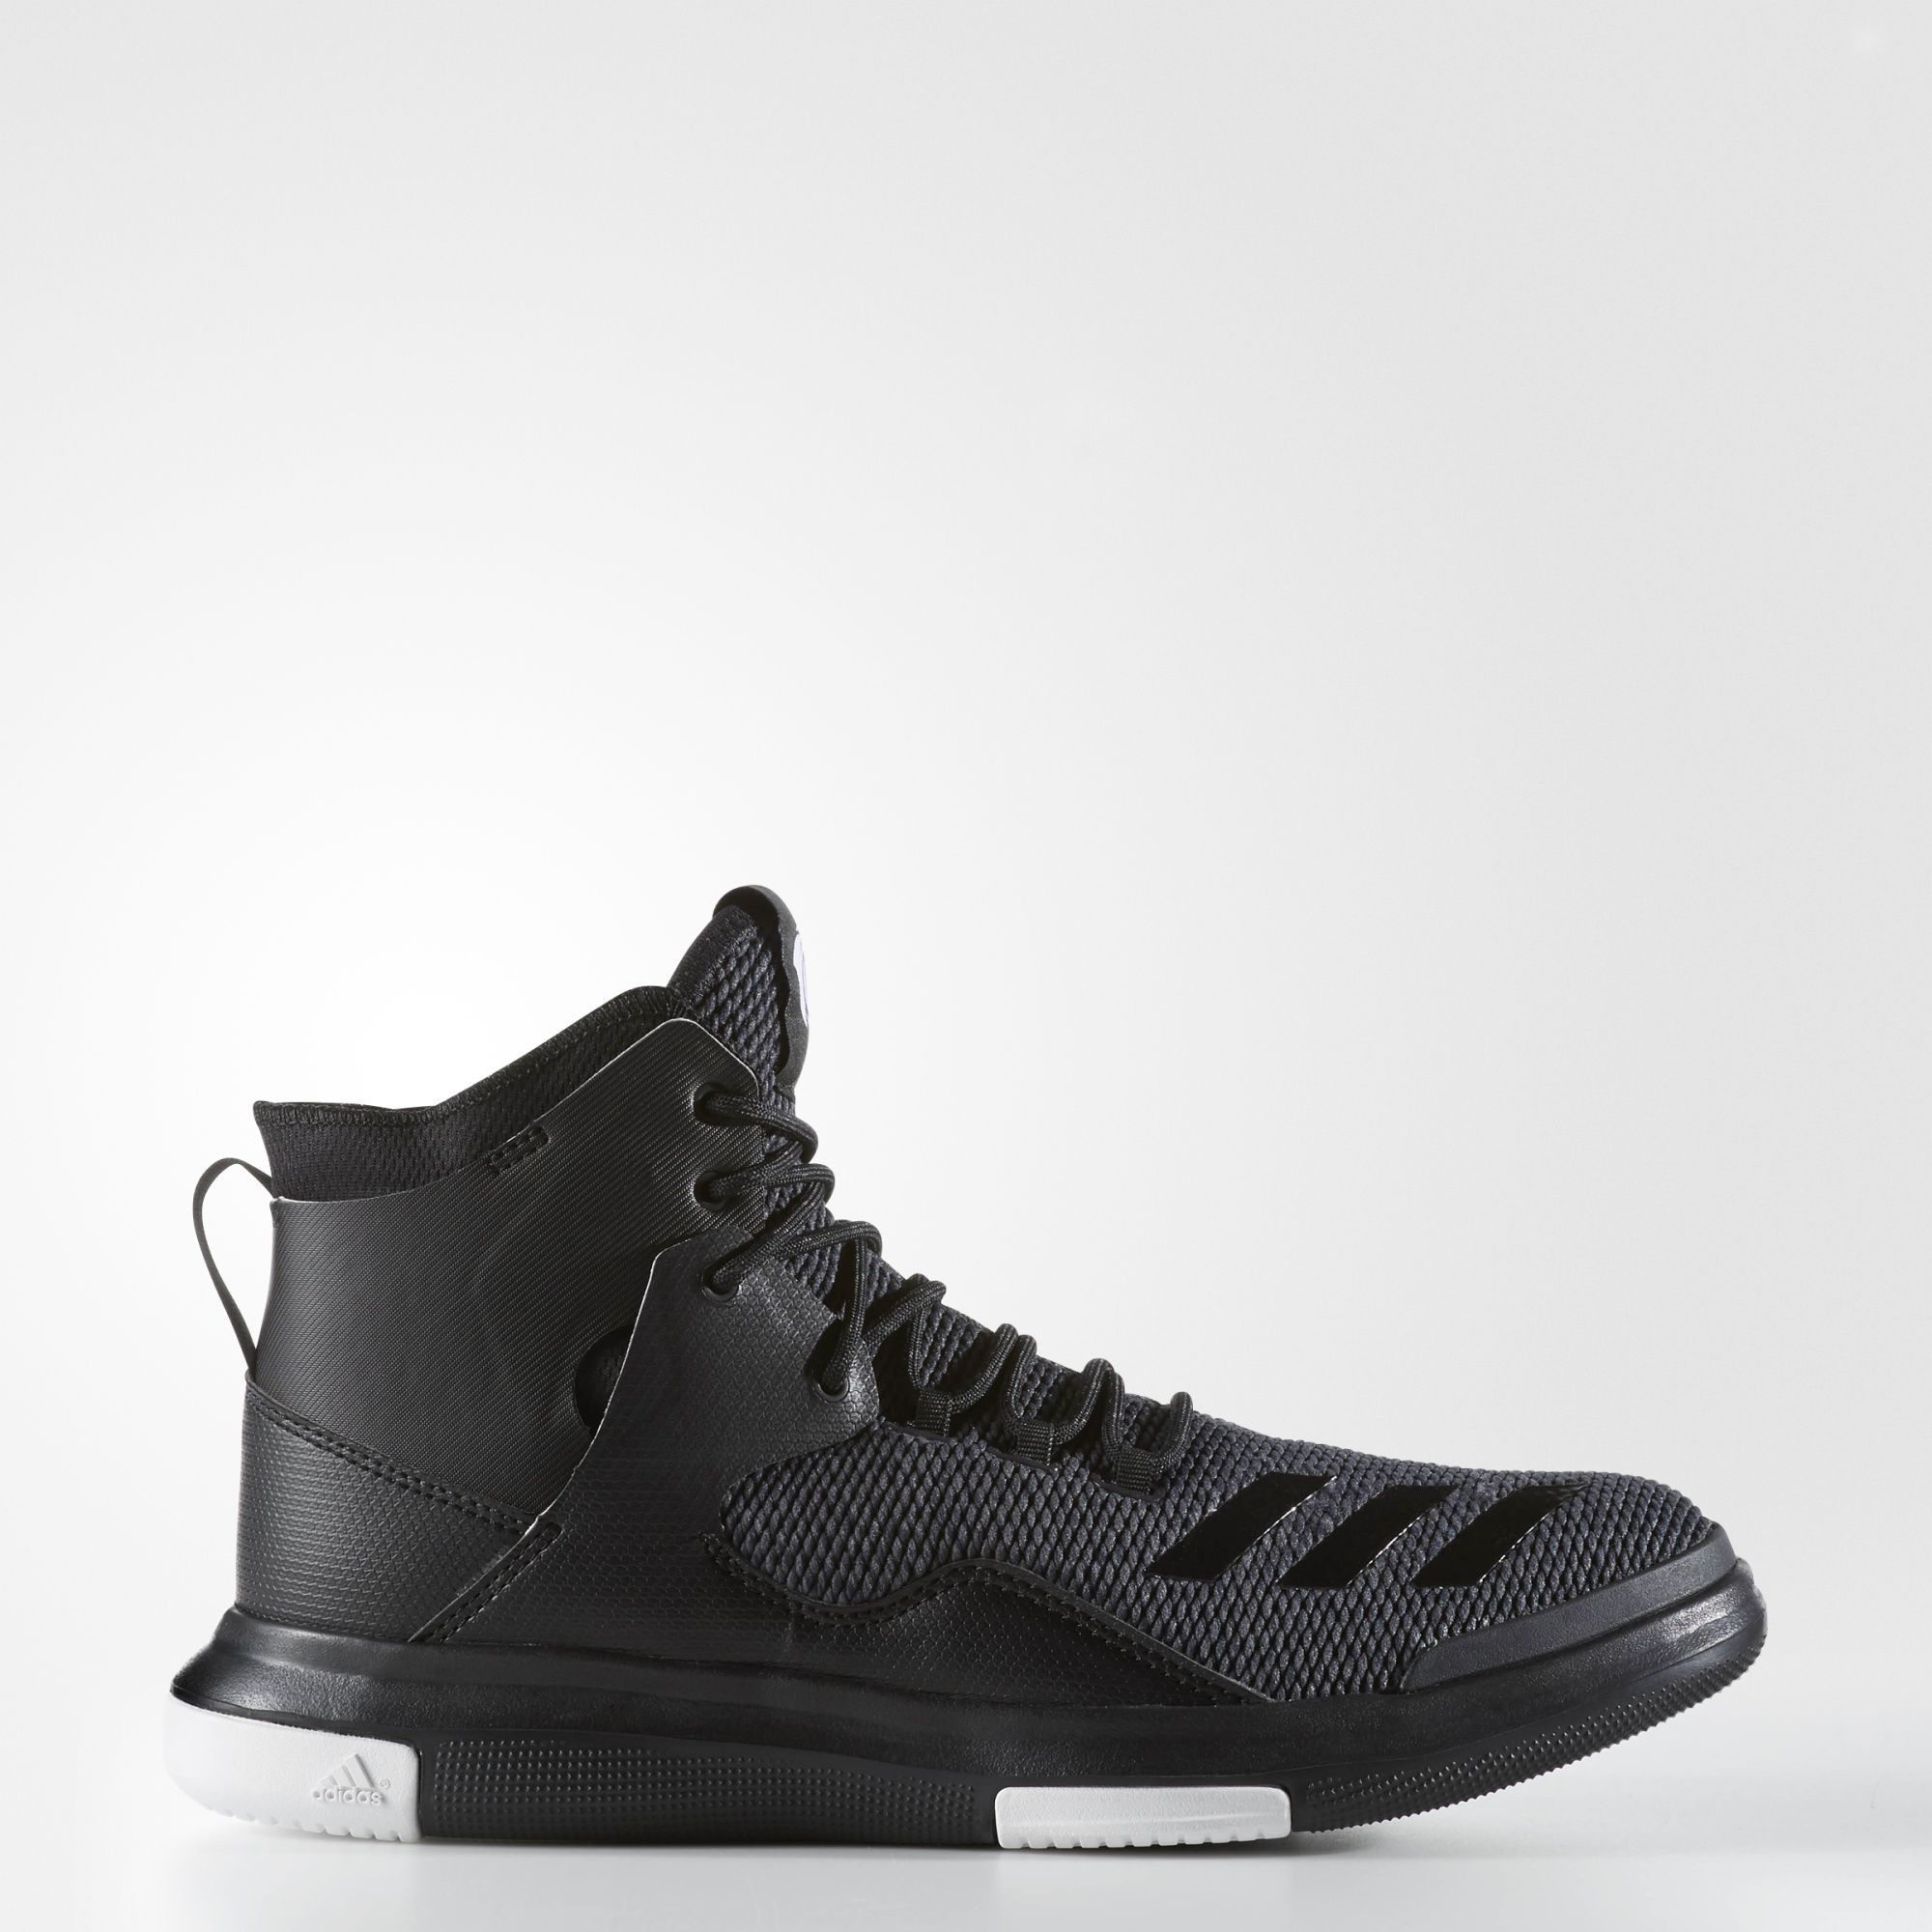 Zapatos negros de verano Adidas D Rose para hombre UfdXtK9XR3